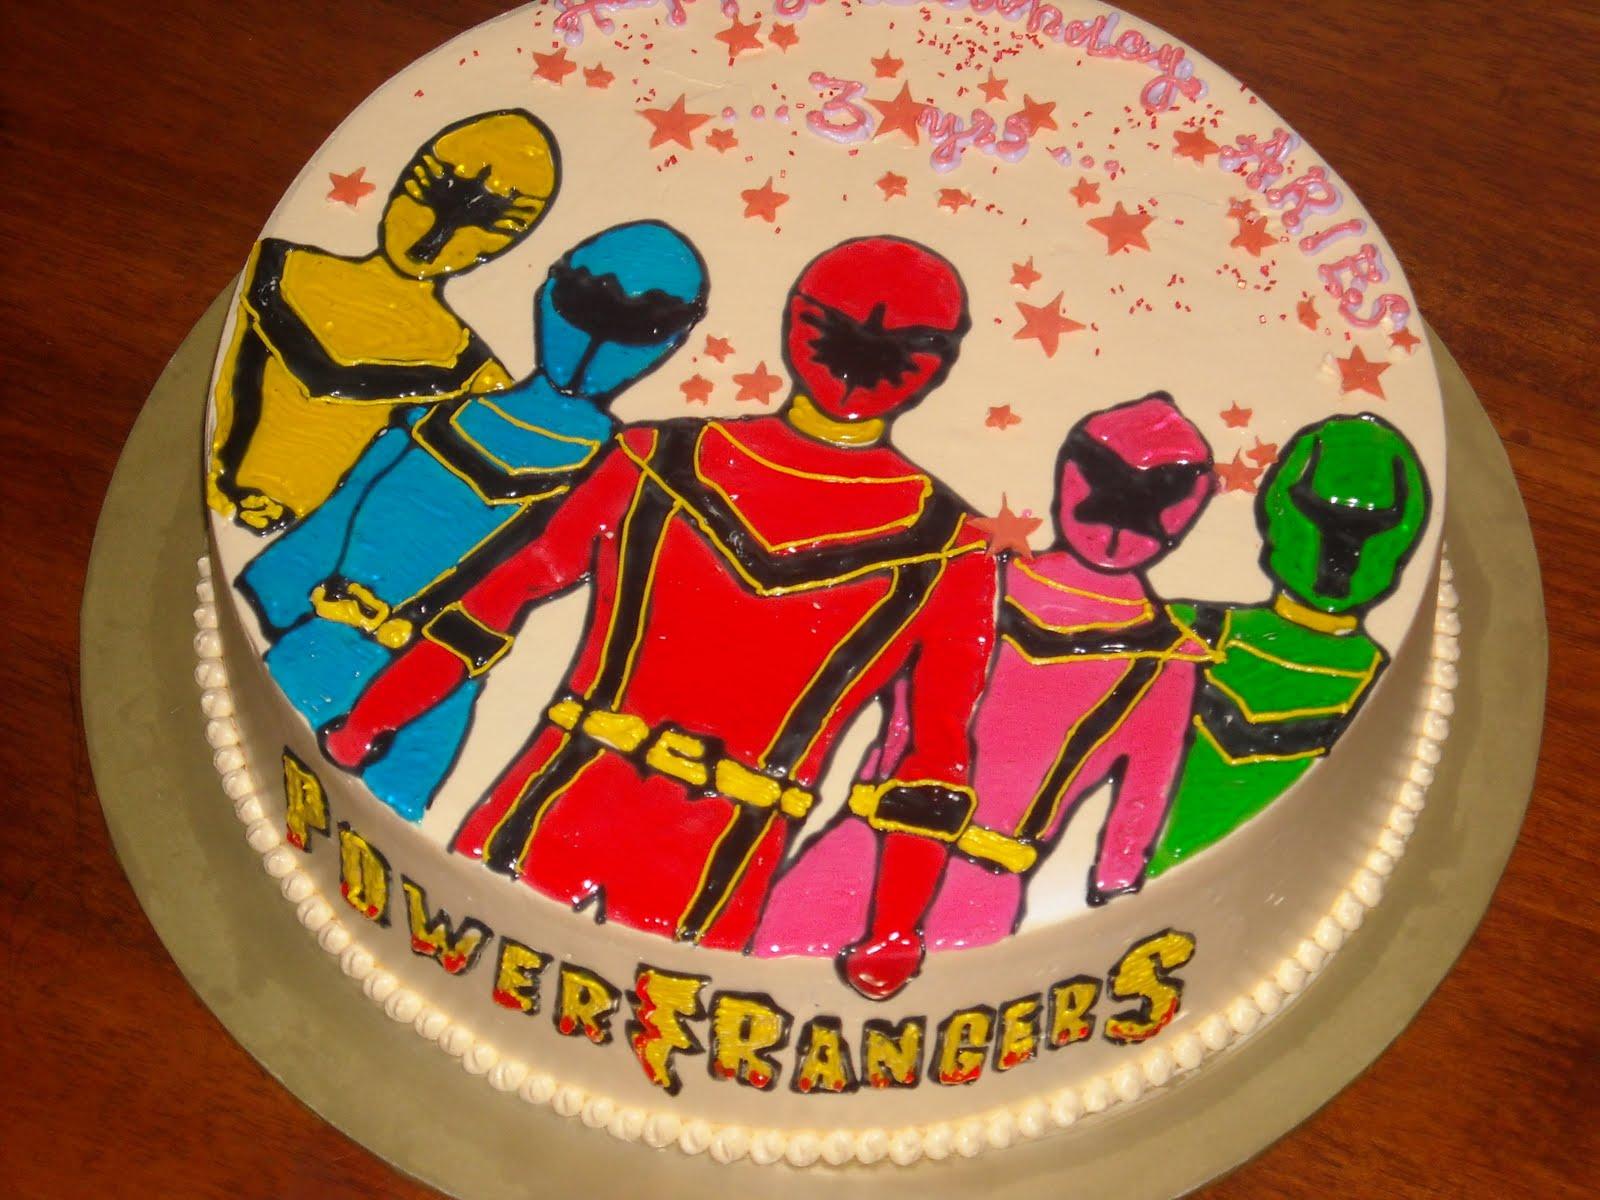 Swell 9 Power Rangers Birthday Cakes Brookshires Photo Birthday Cake Funny Birthday Cards Online Alyptdamsfinfo